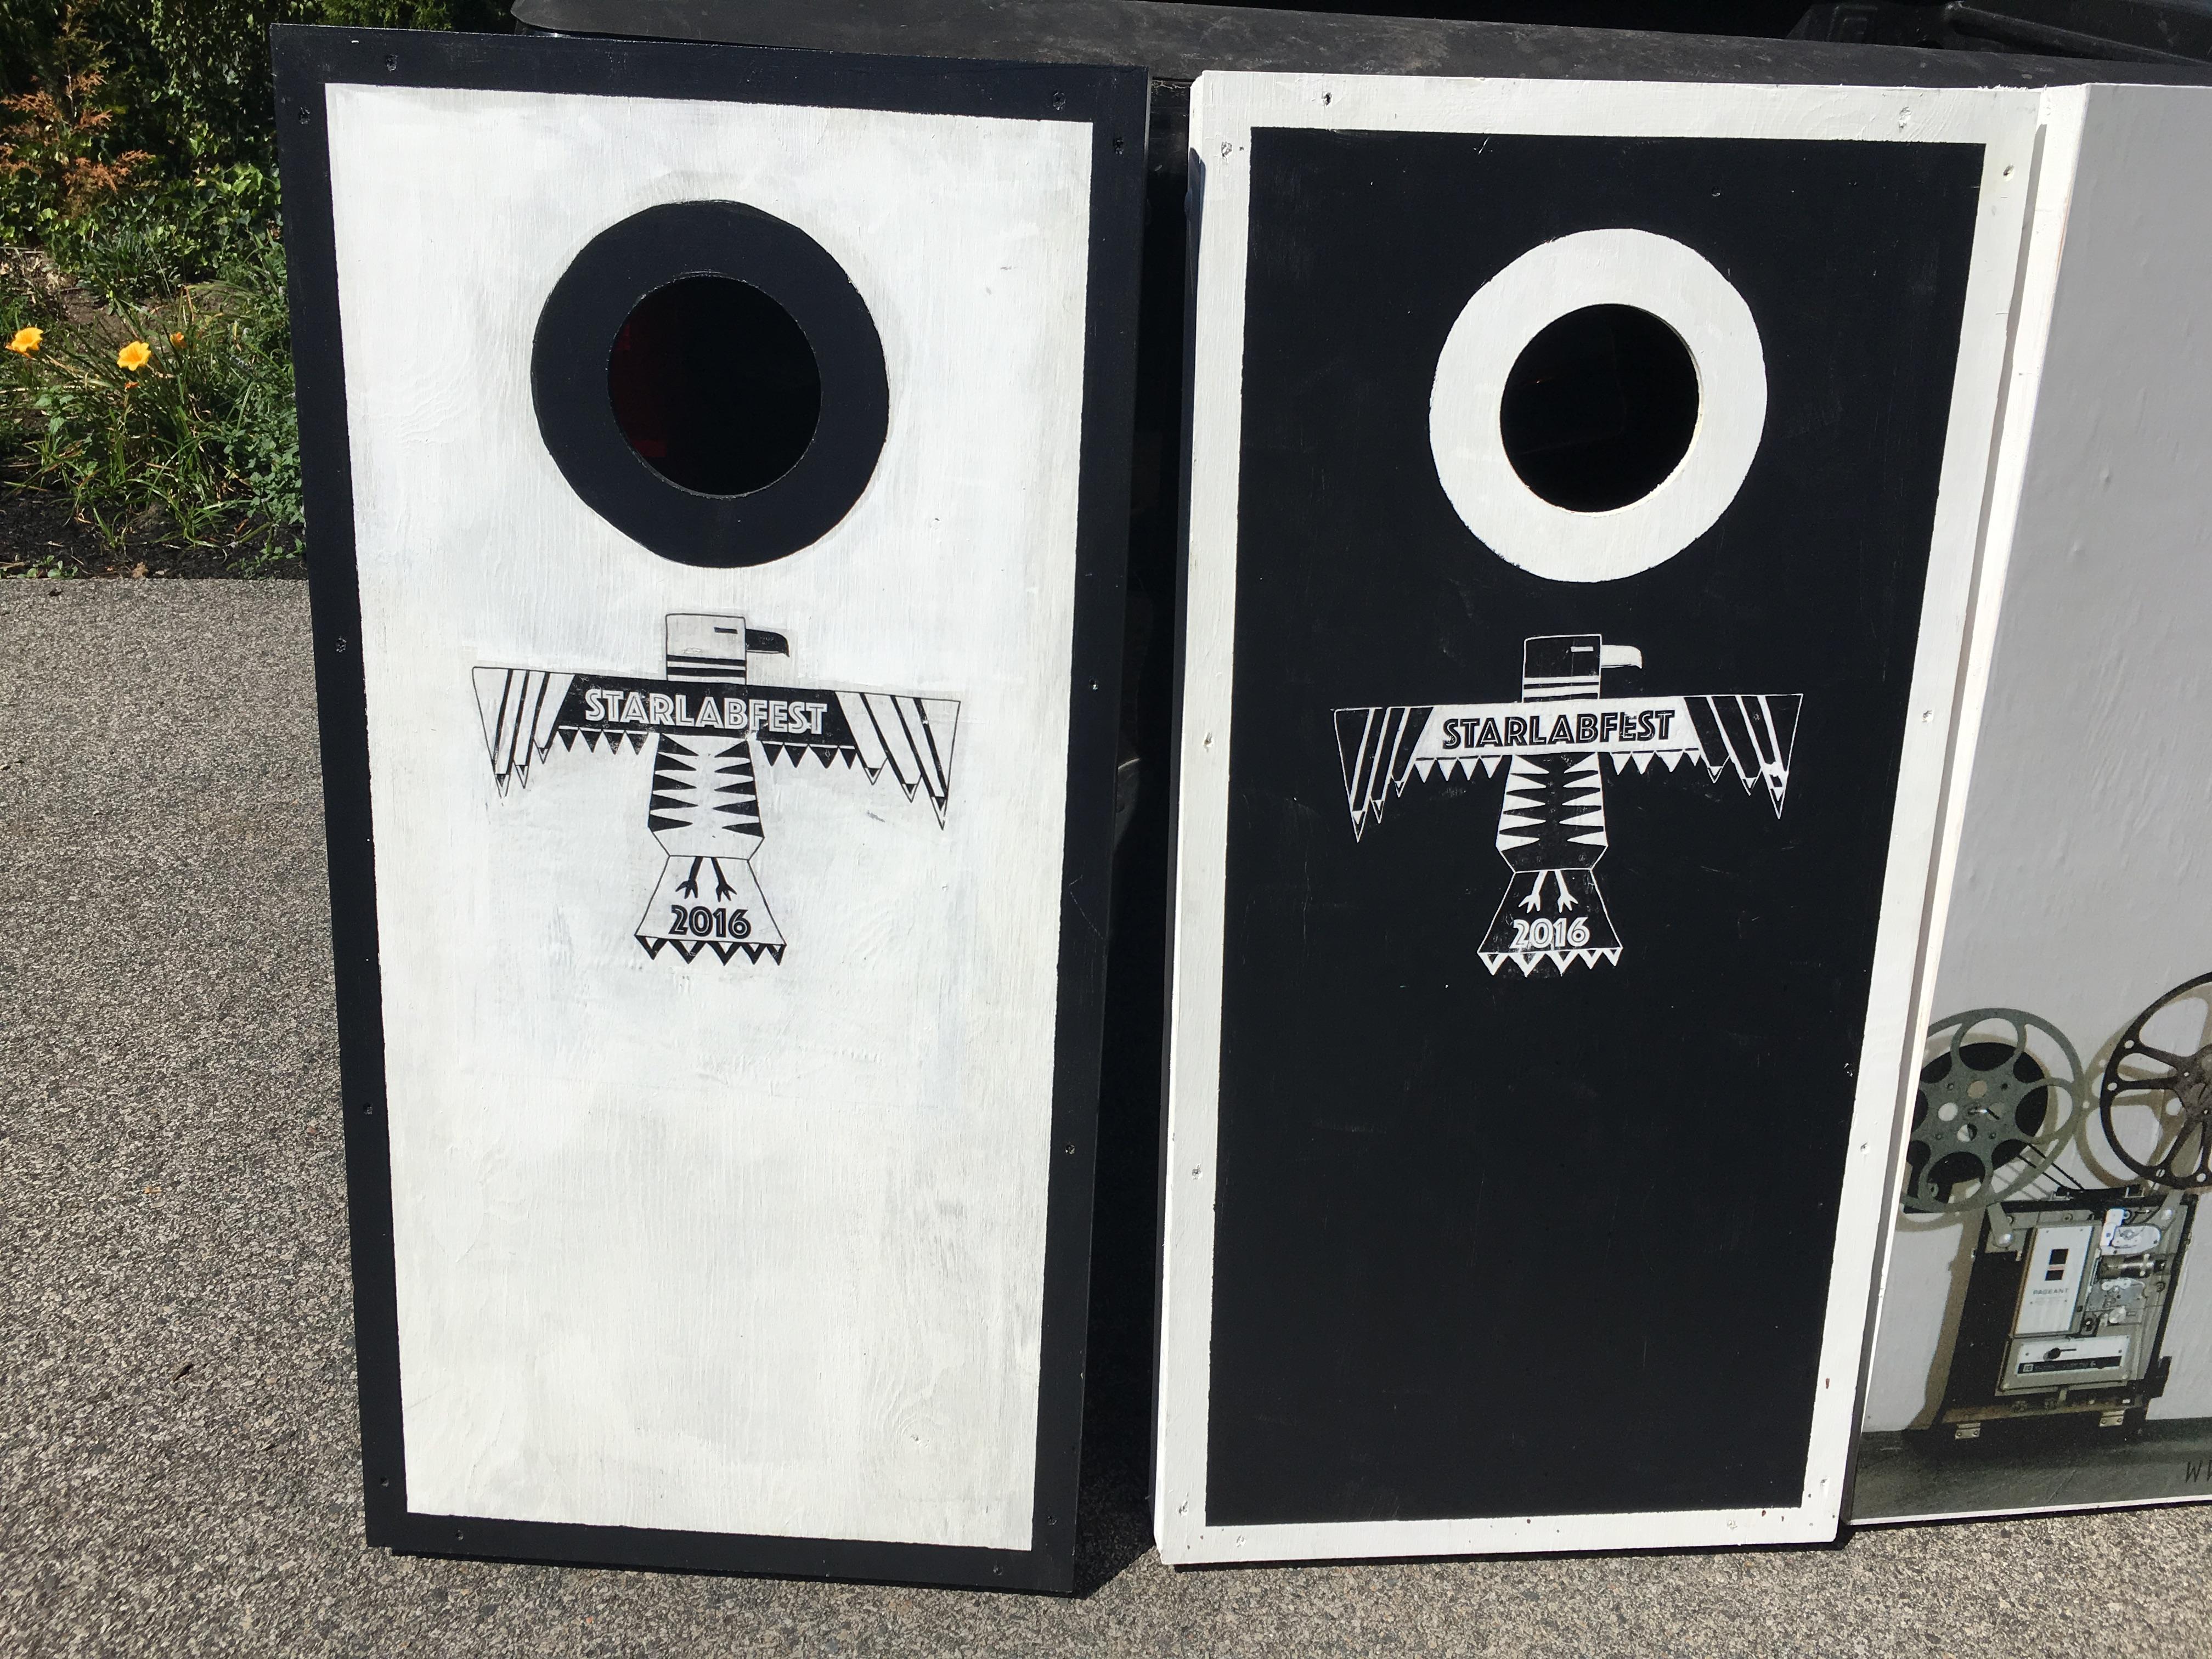 Starlabfest Cornhole boards